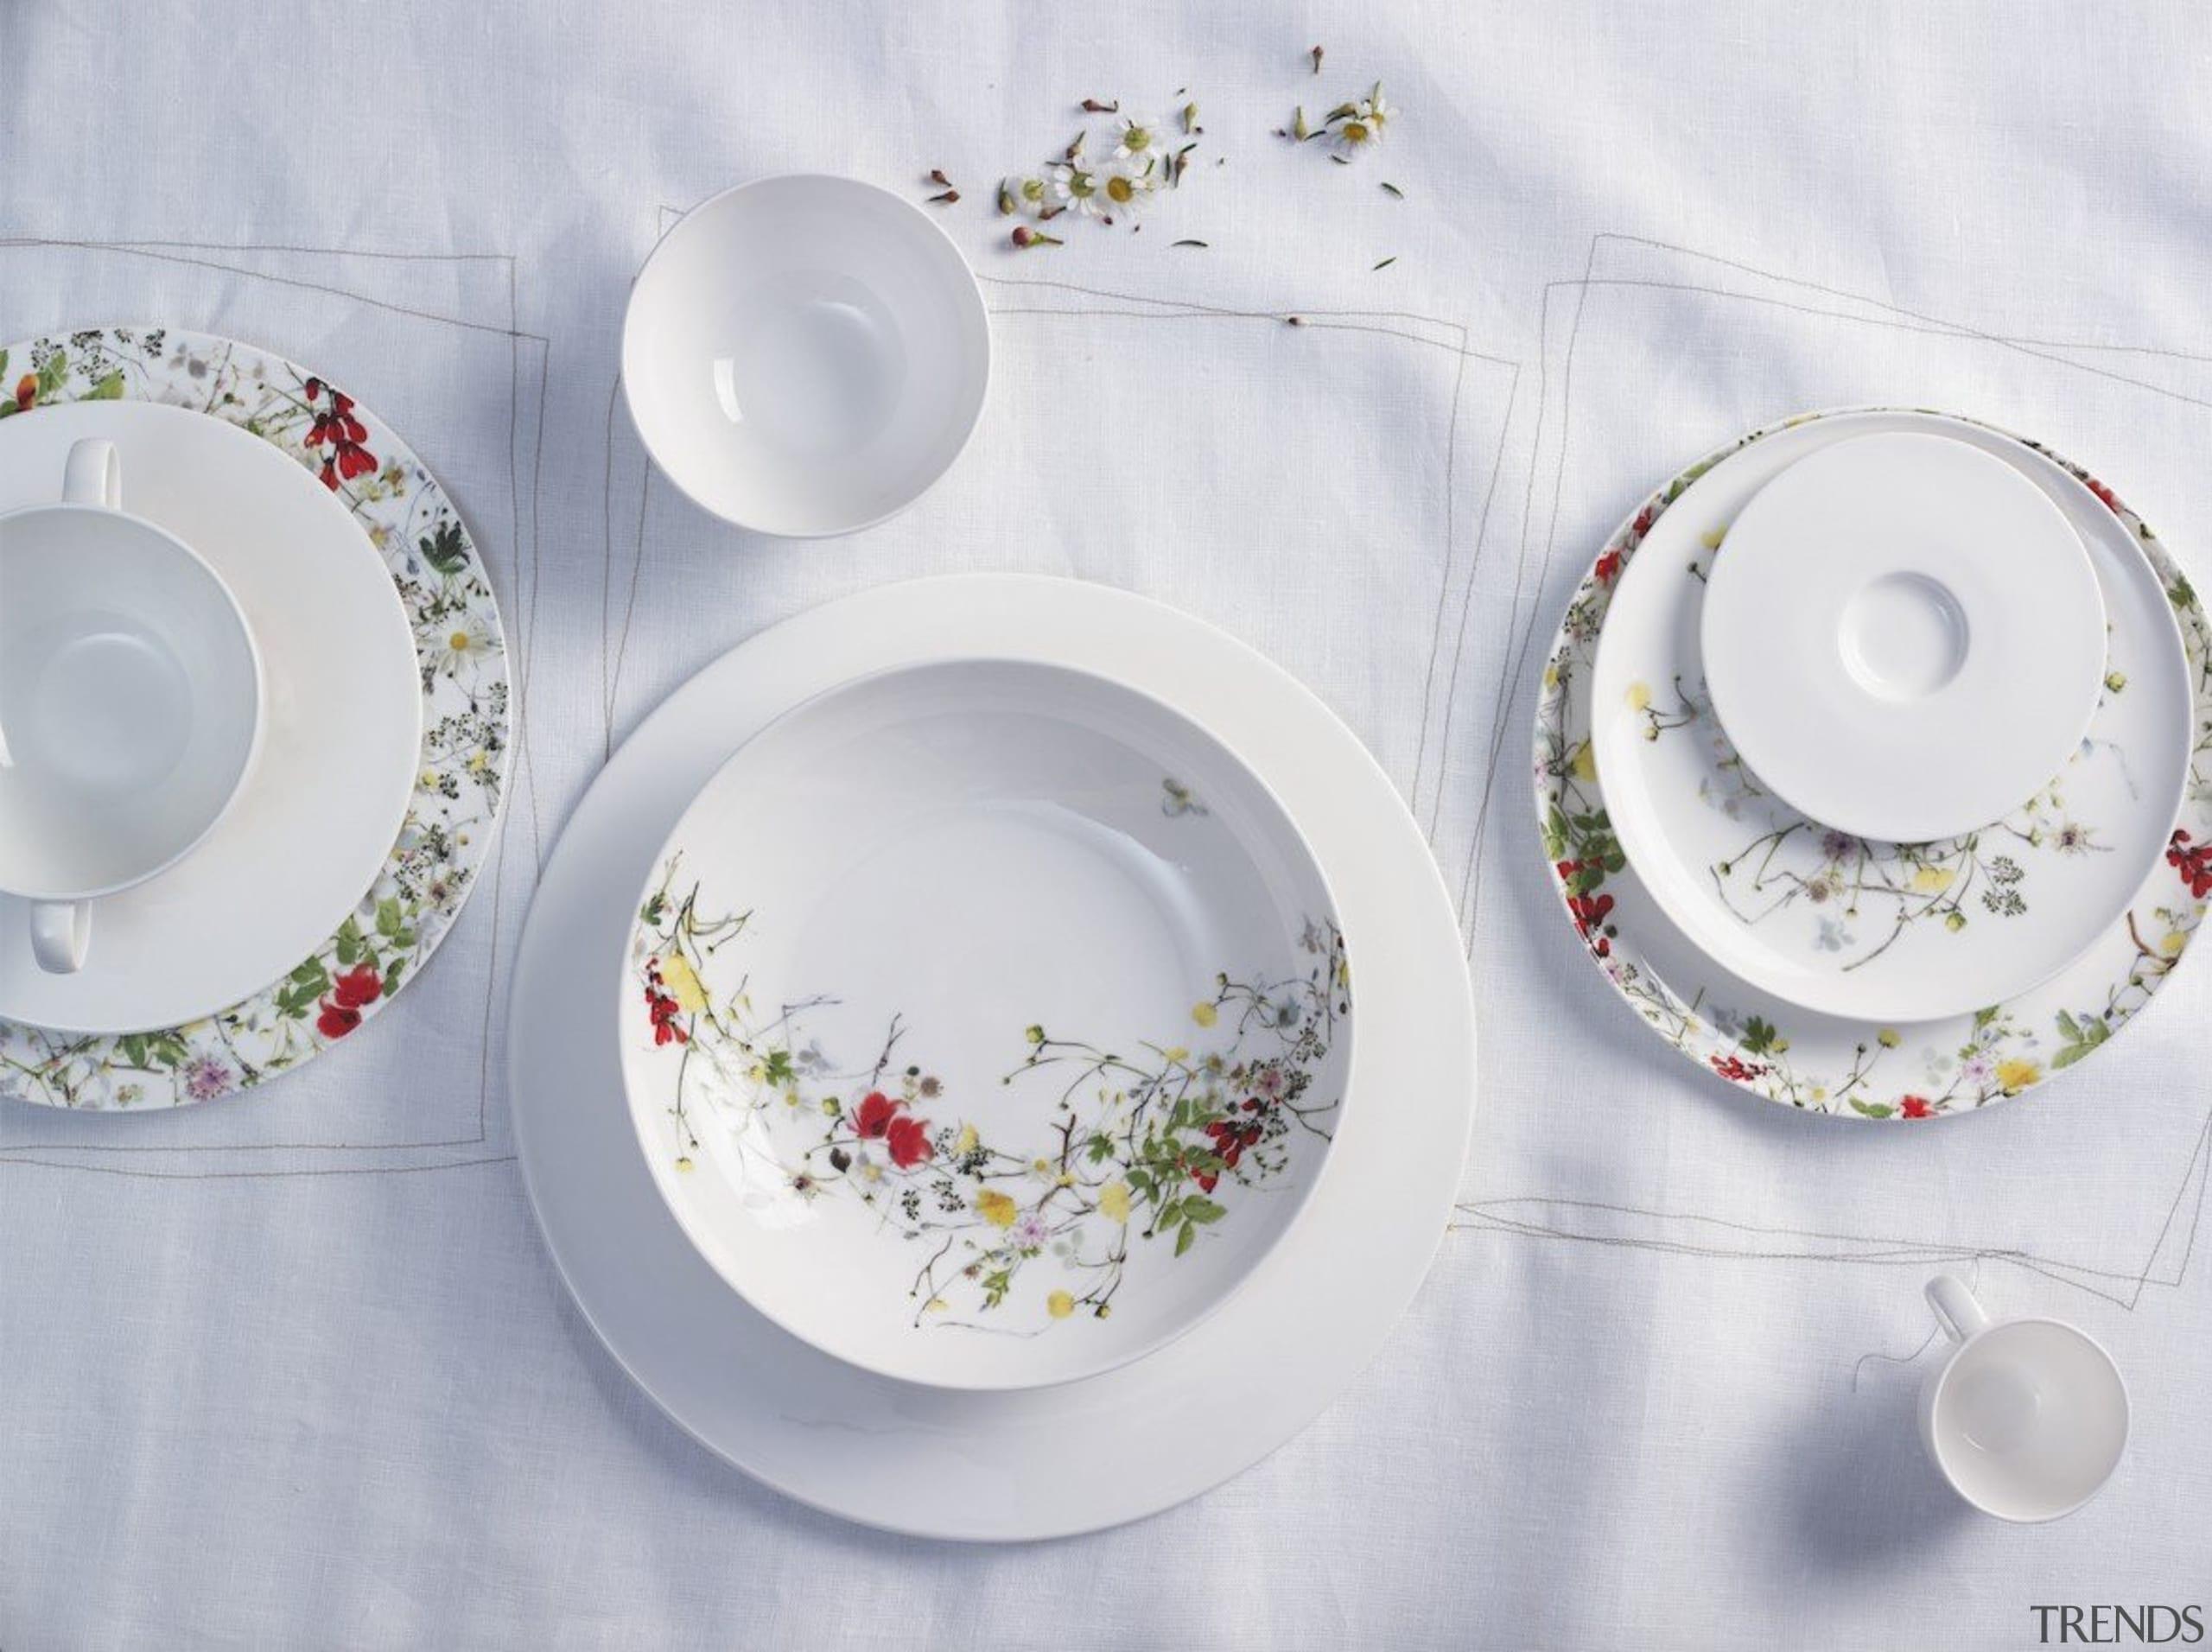 Fine China porcelain - Fleurs - ceramic   ceramic, dinnerware set, dishware, material, plate, platter, porcelain, saucer, serveware, tableware, gray